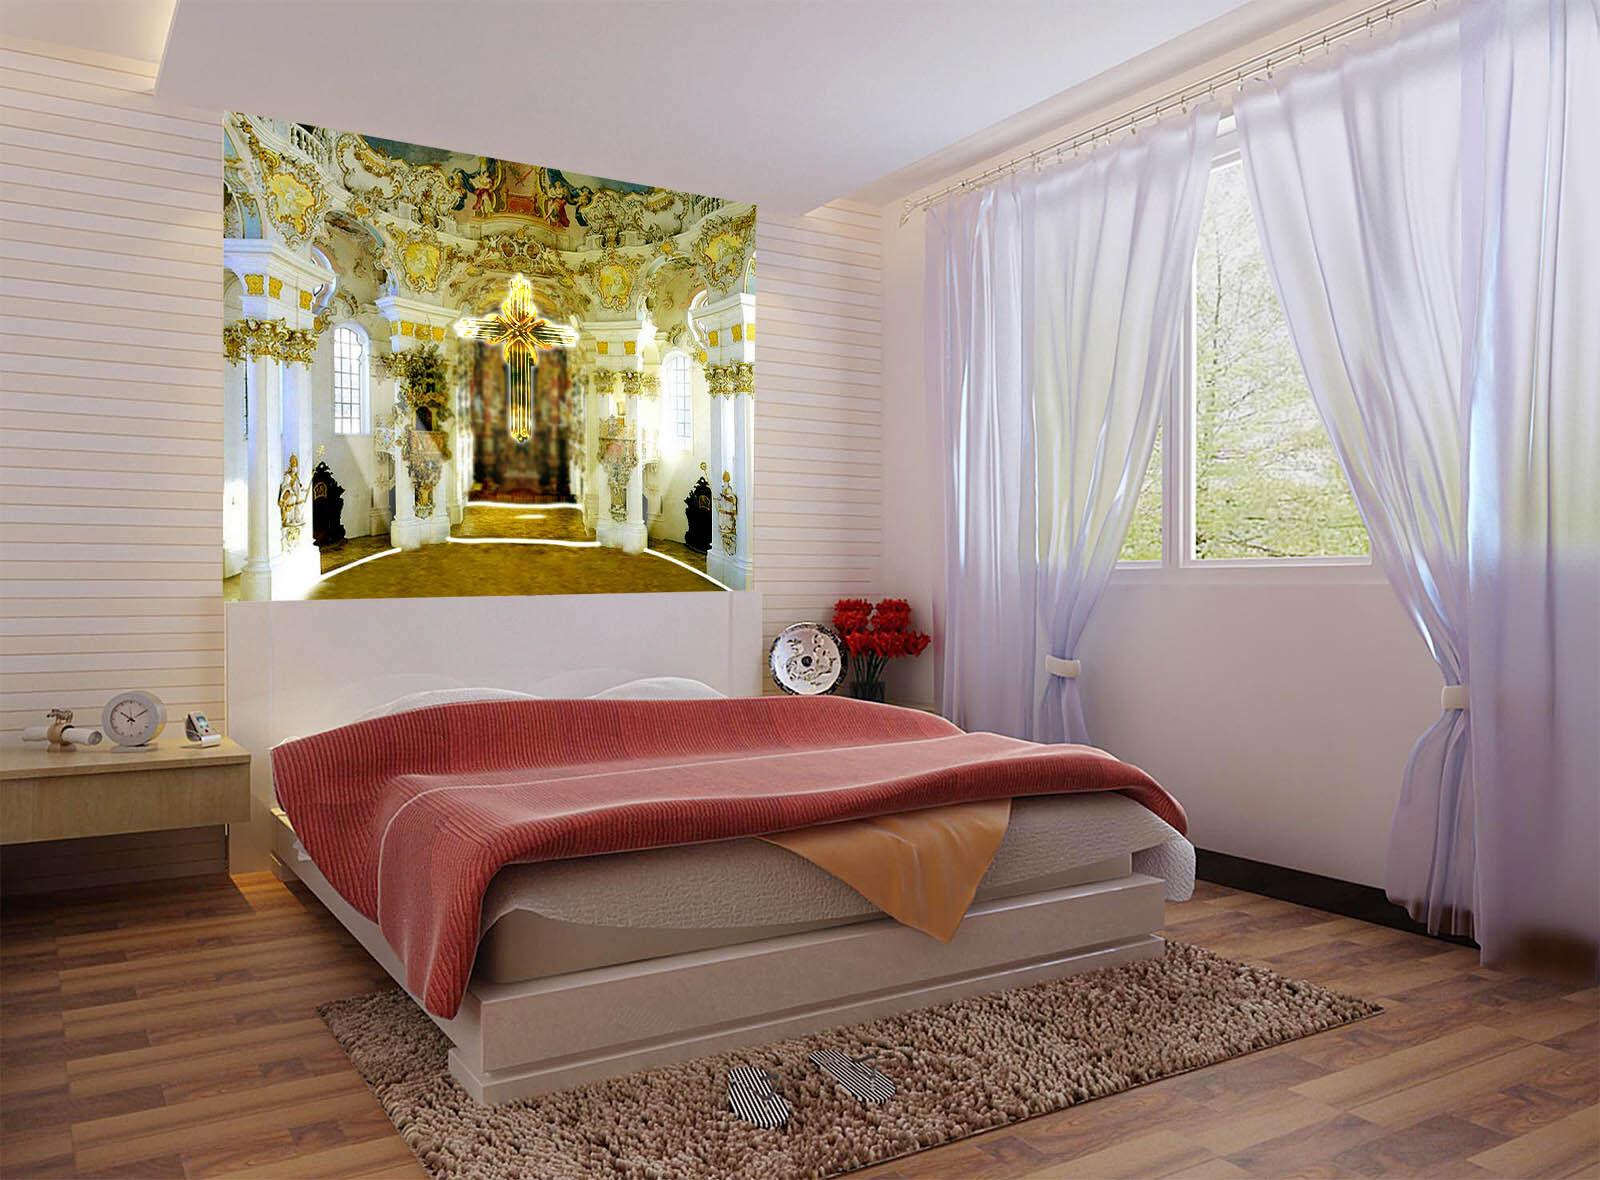 3D Mode Kirche 978 Tapete Wandgemälde Tapete Tapeten Bild Familie DE  Summer | Starker Wert  | Starker Wert  | Sehr gute Qualität